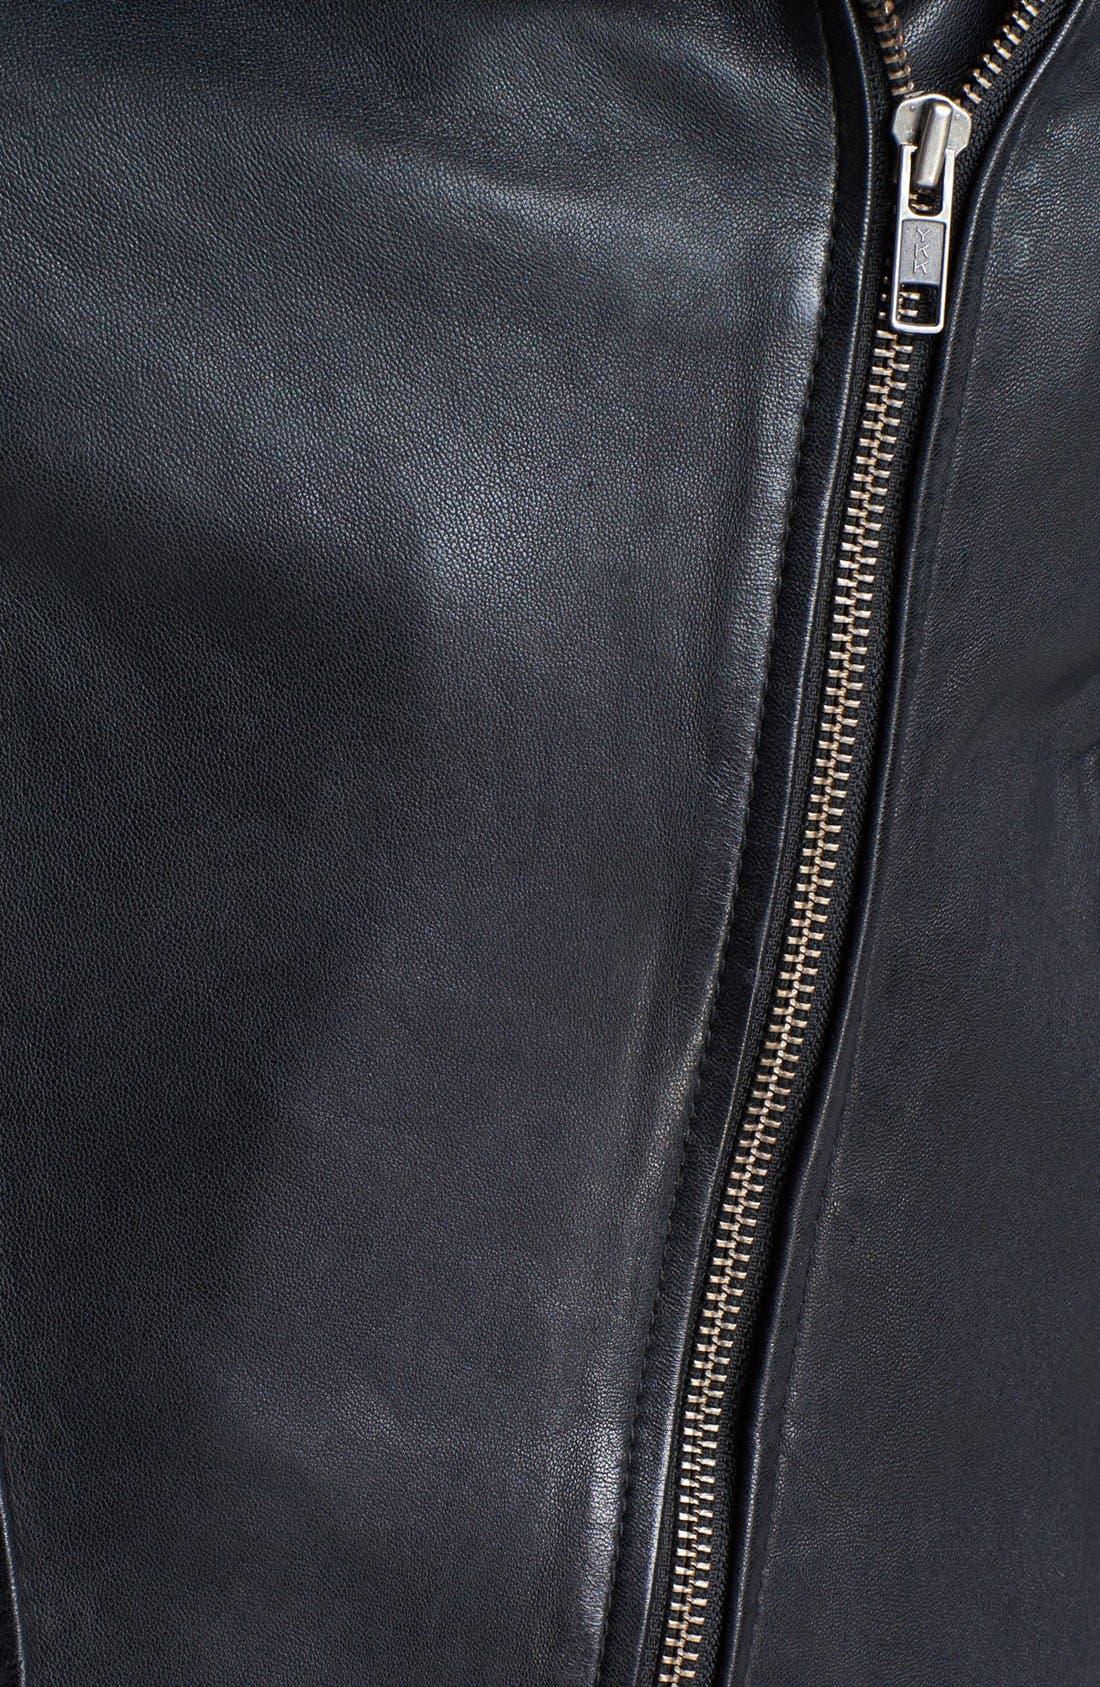 Alternate Image 3  - Soia & Kyo Zip Collar Leather Jacket